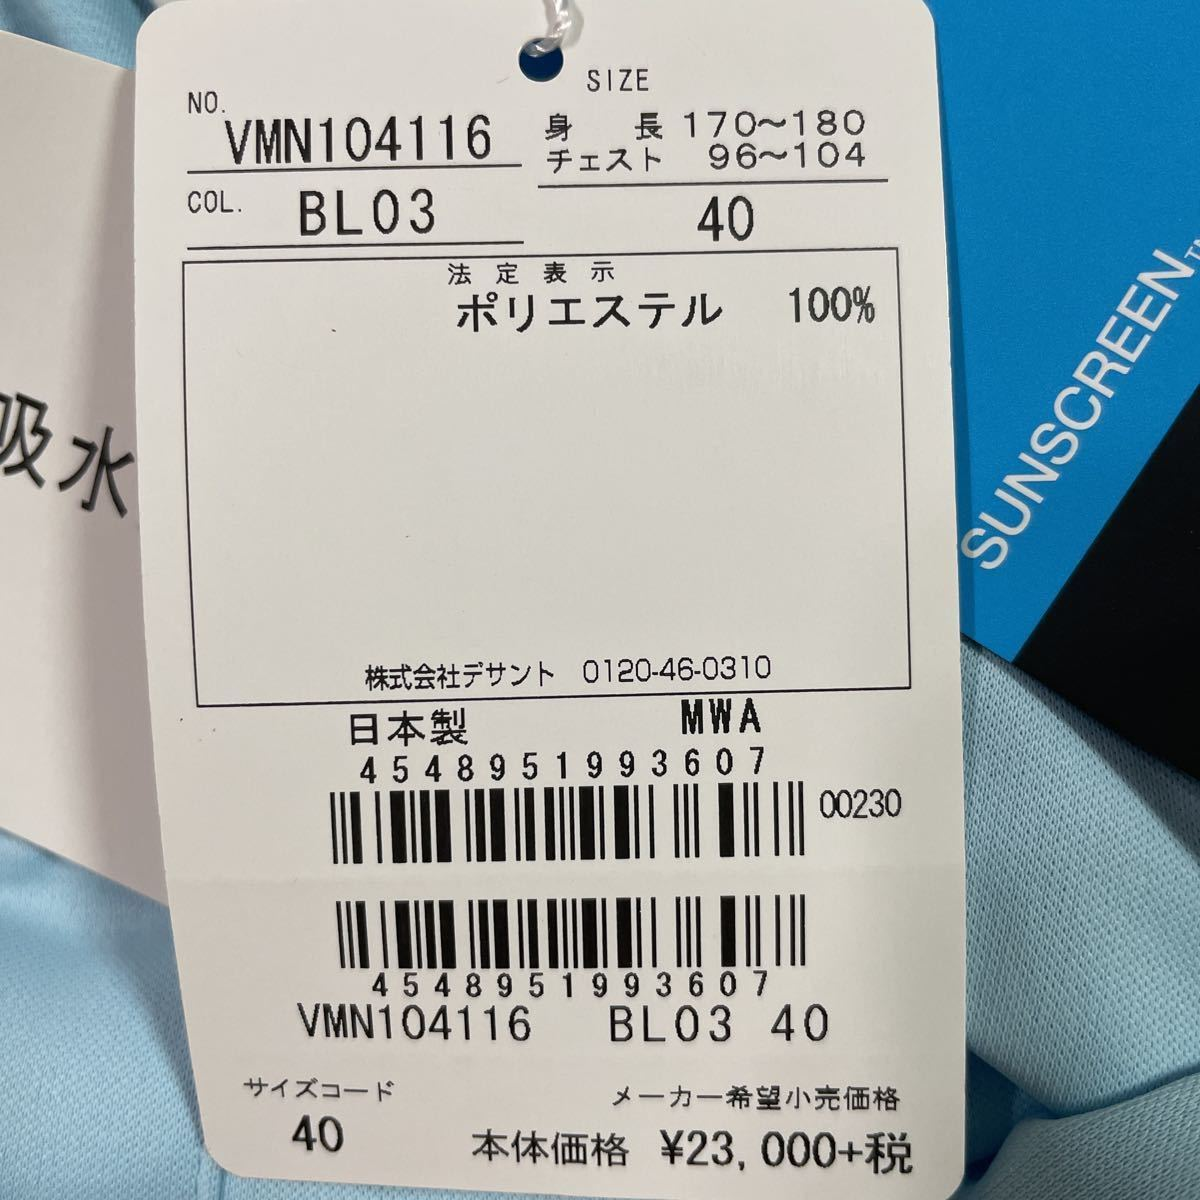 L 日本製/新品定価25300円/デサント/ランバンスポール/LANVIN/高品質/メンズ/長袖ポロシャツ/ゴルフシャツ/吸水速乾/サンスクリーン/BL_画像7